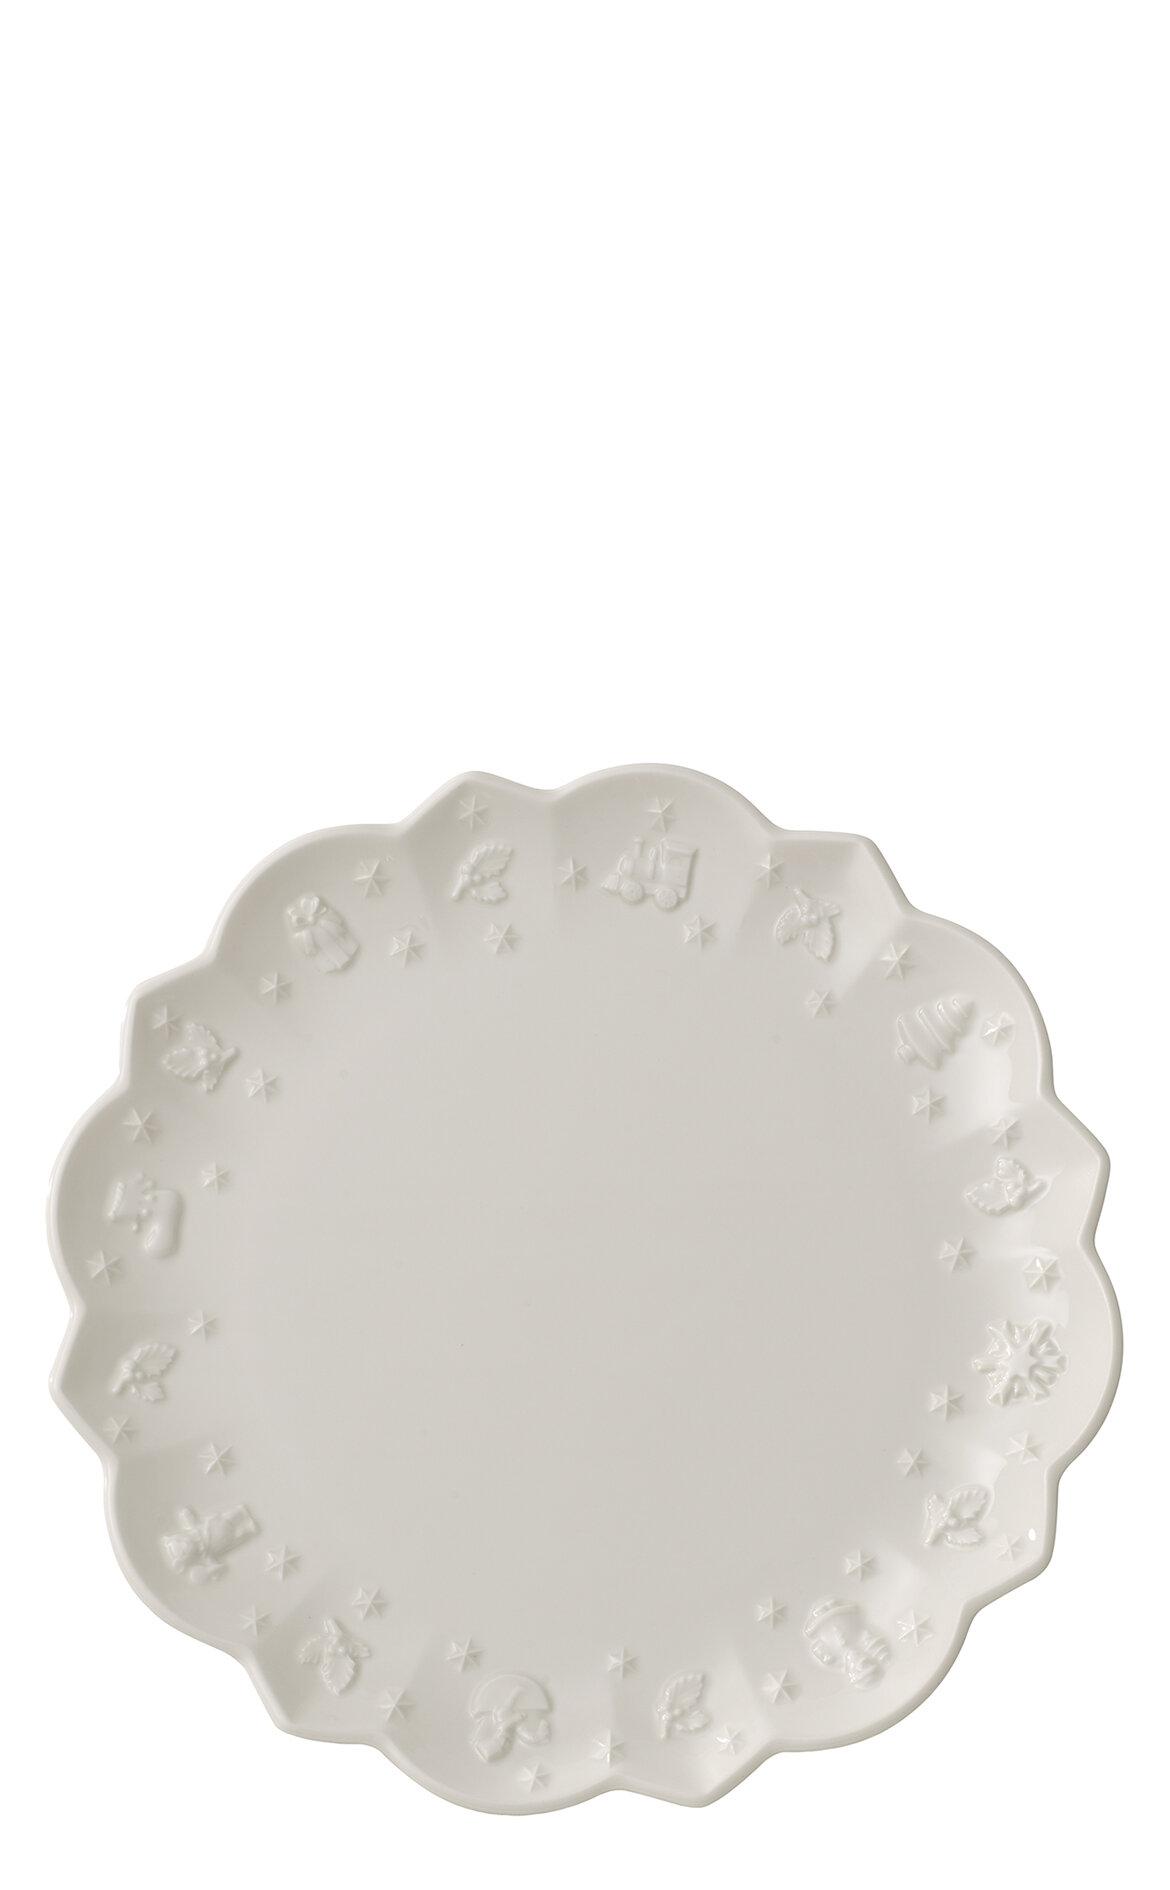 Villeroy & Boch Toy's Delight Royal  Pasta Tabağı, 18 cm